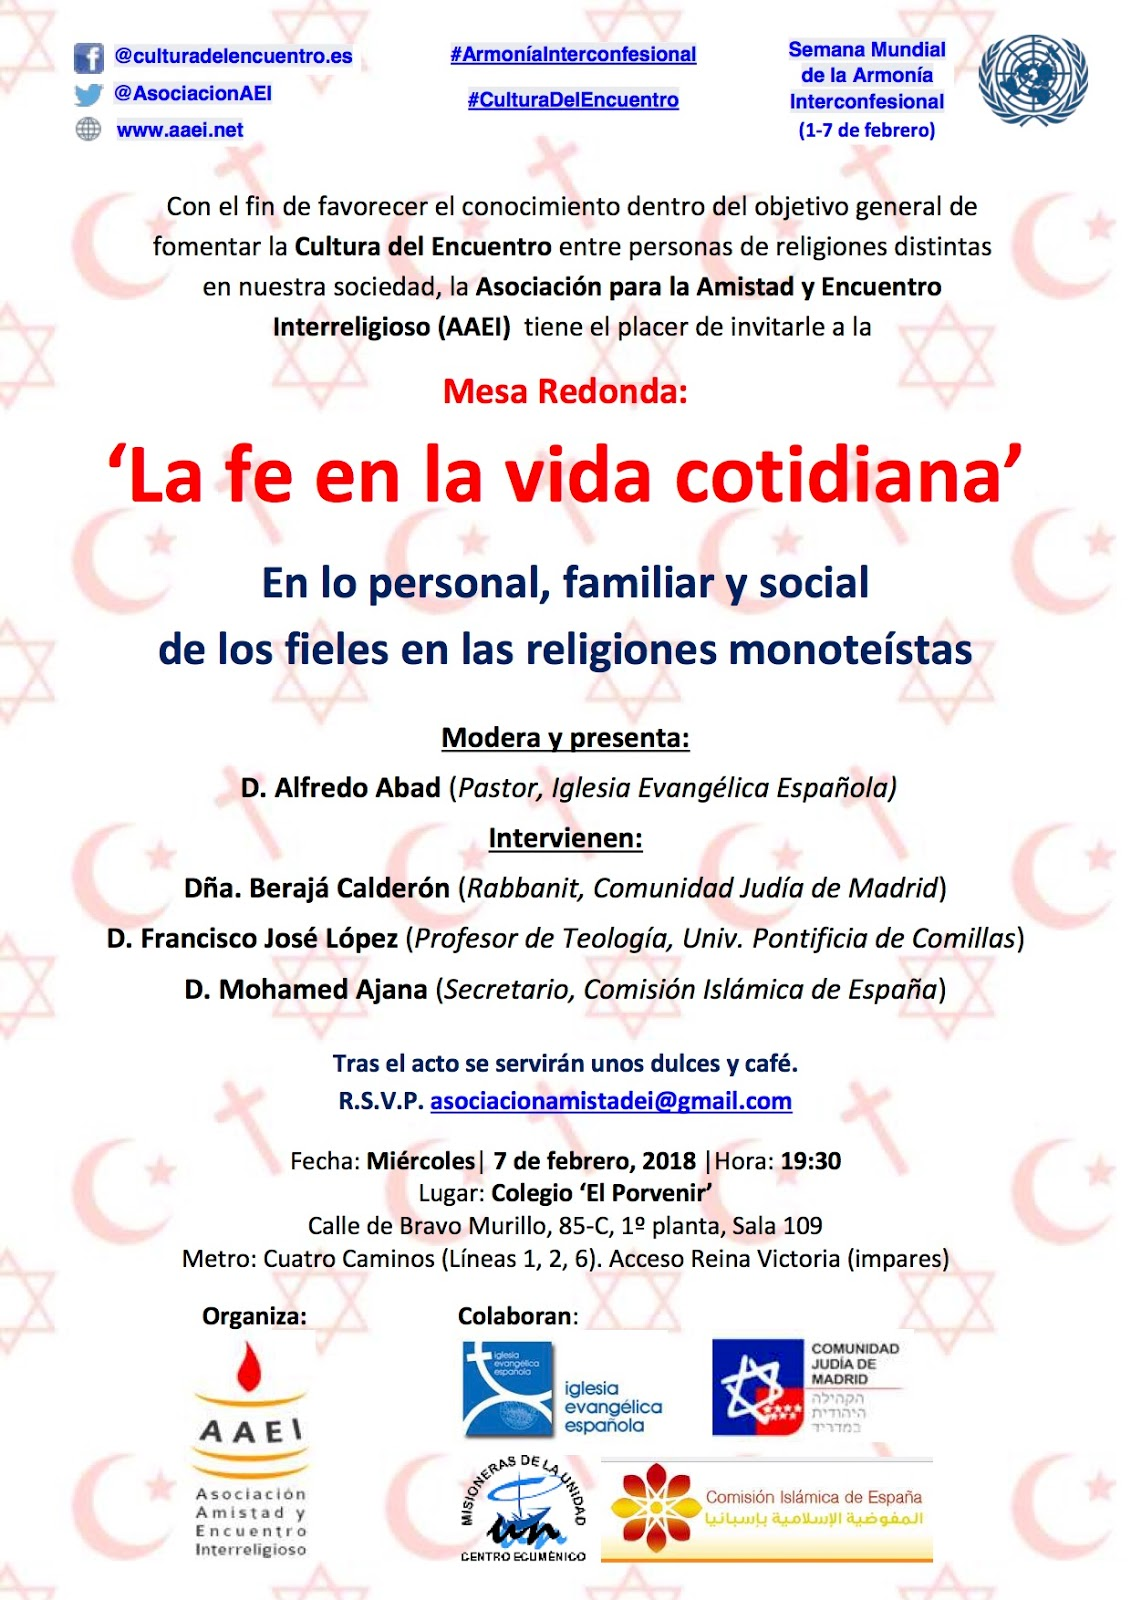 cartel_invitacion_mesa_redonda_colegio_el_porvenir_-_7_02_2018_19_30hrs